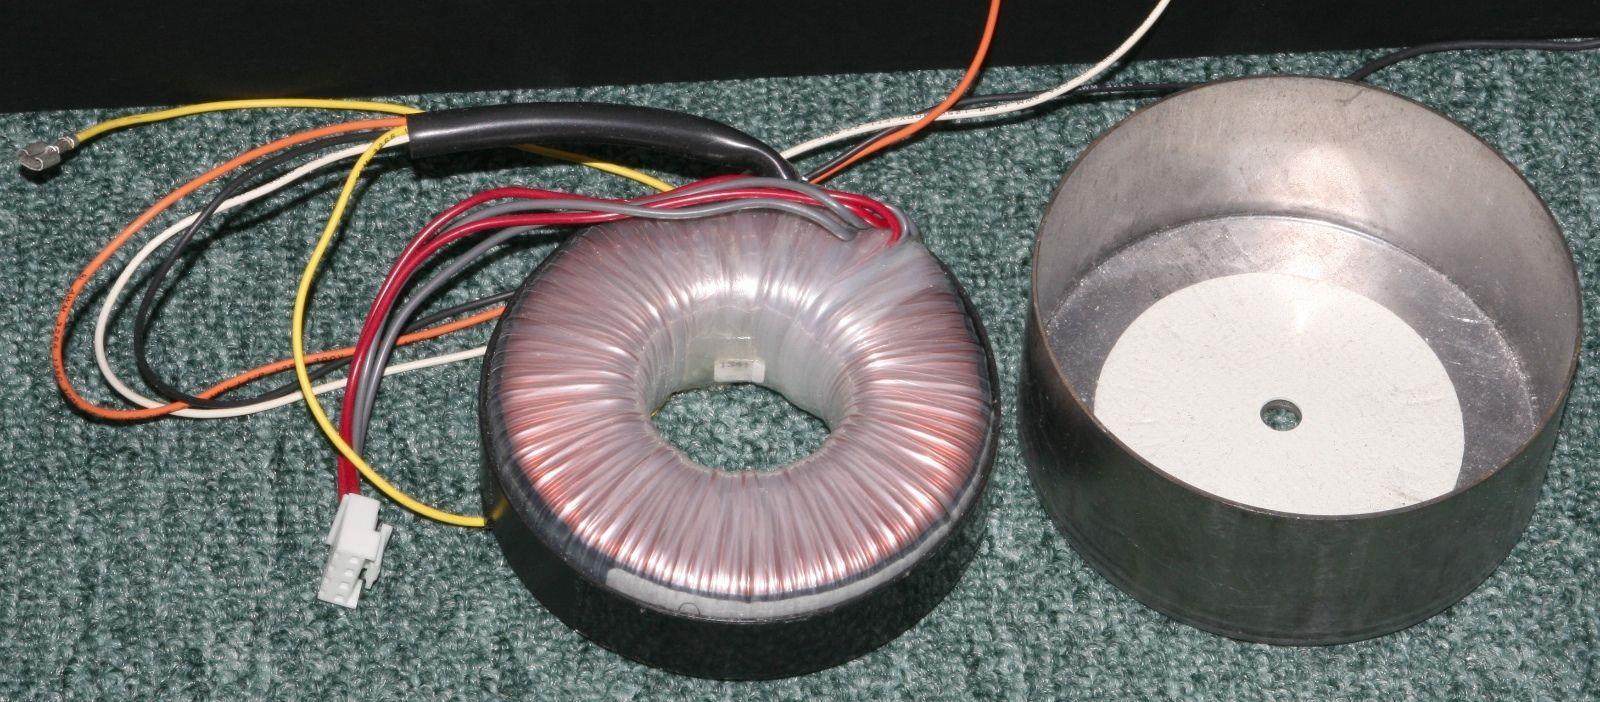 TOROID TRANSFORMER / AUDIO PROJECTS. 18, 0, 18 VAC AT 2.5 AMP LOAD.  24 0 24 VDC